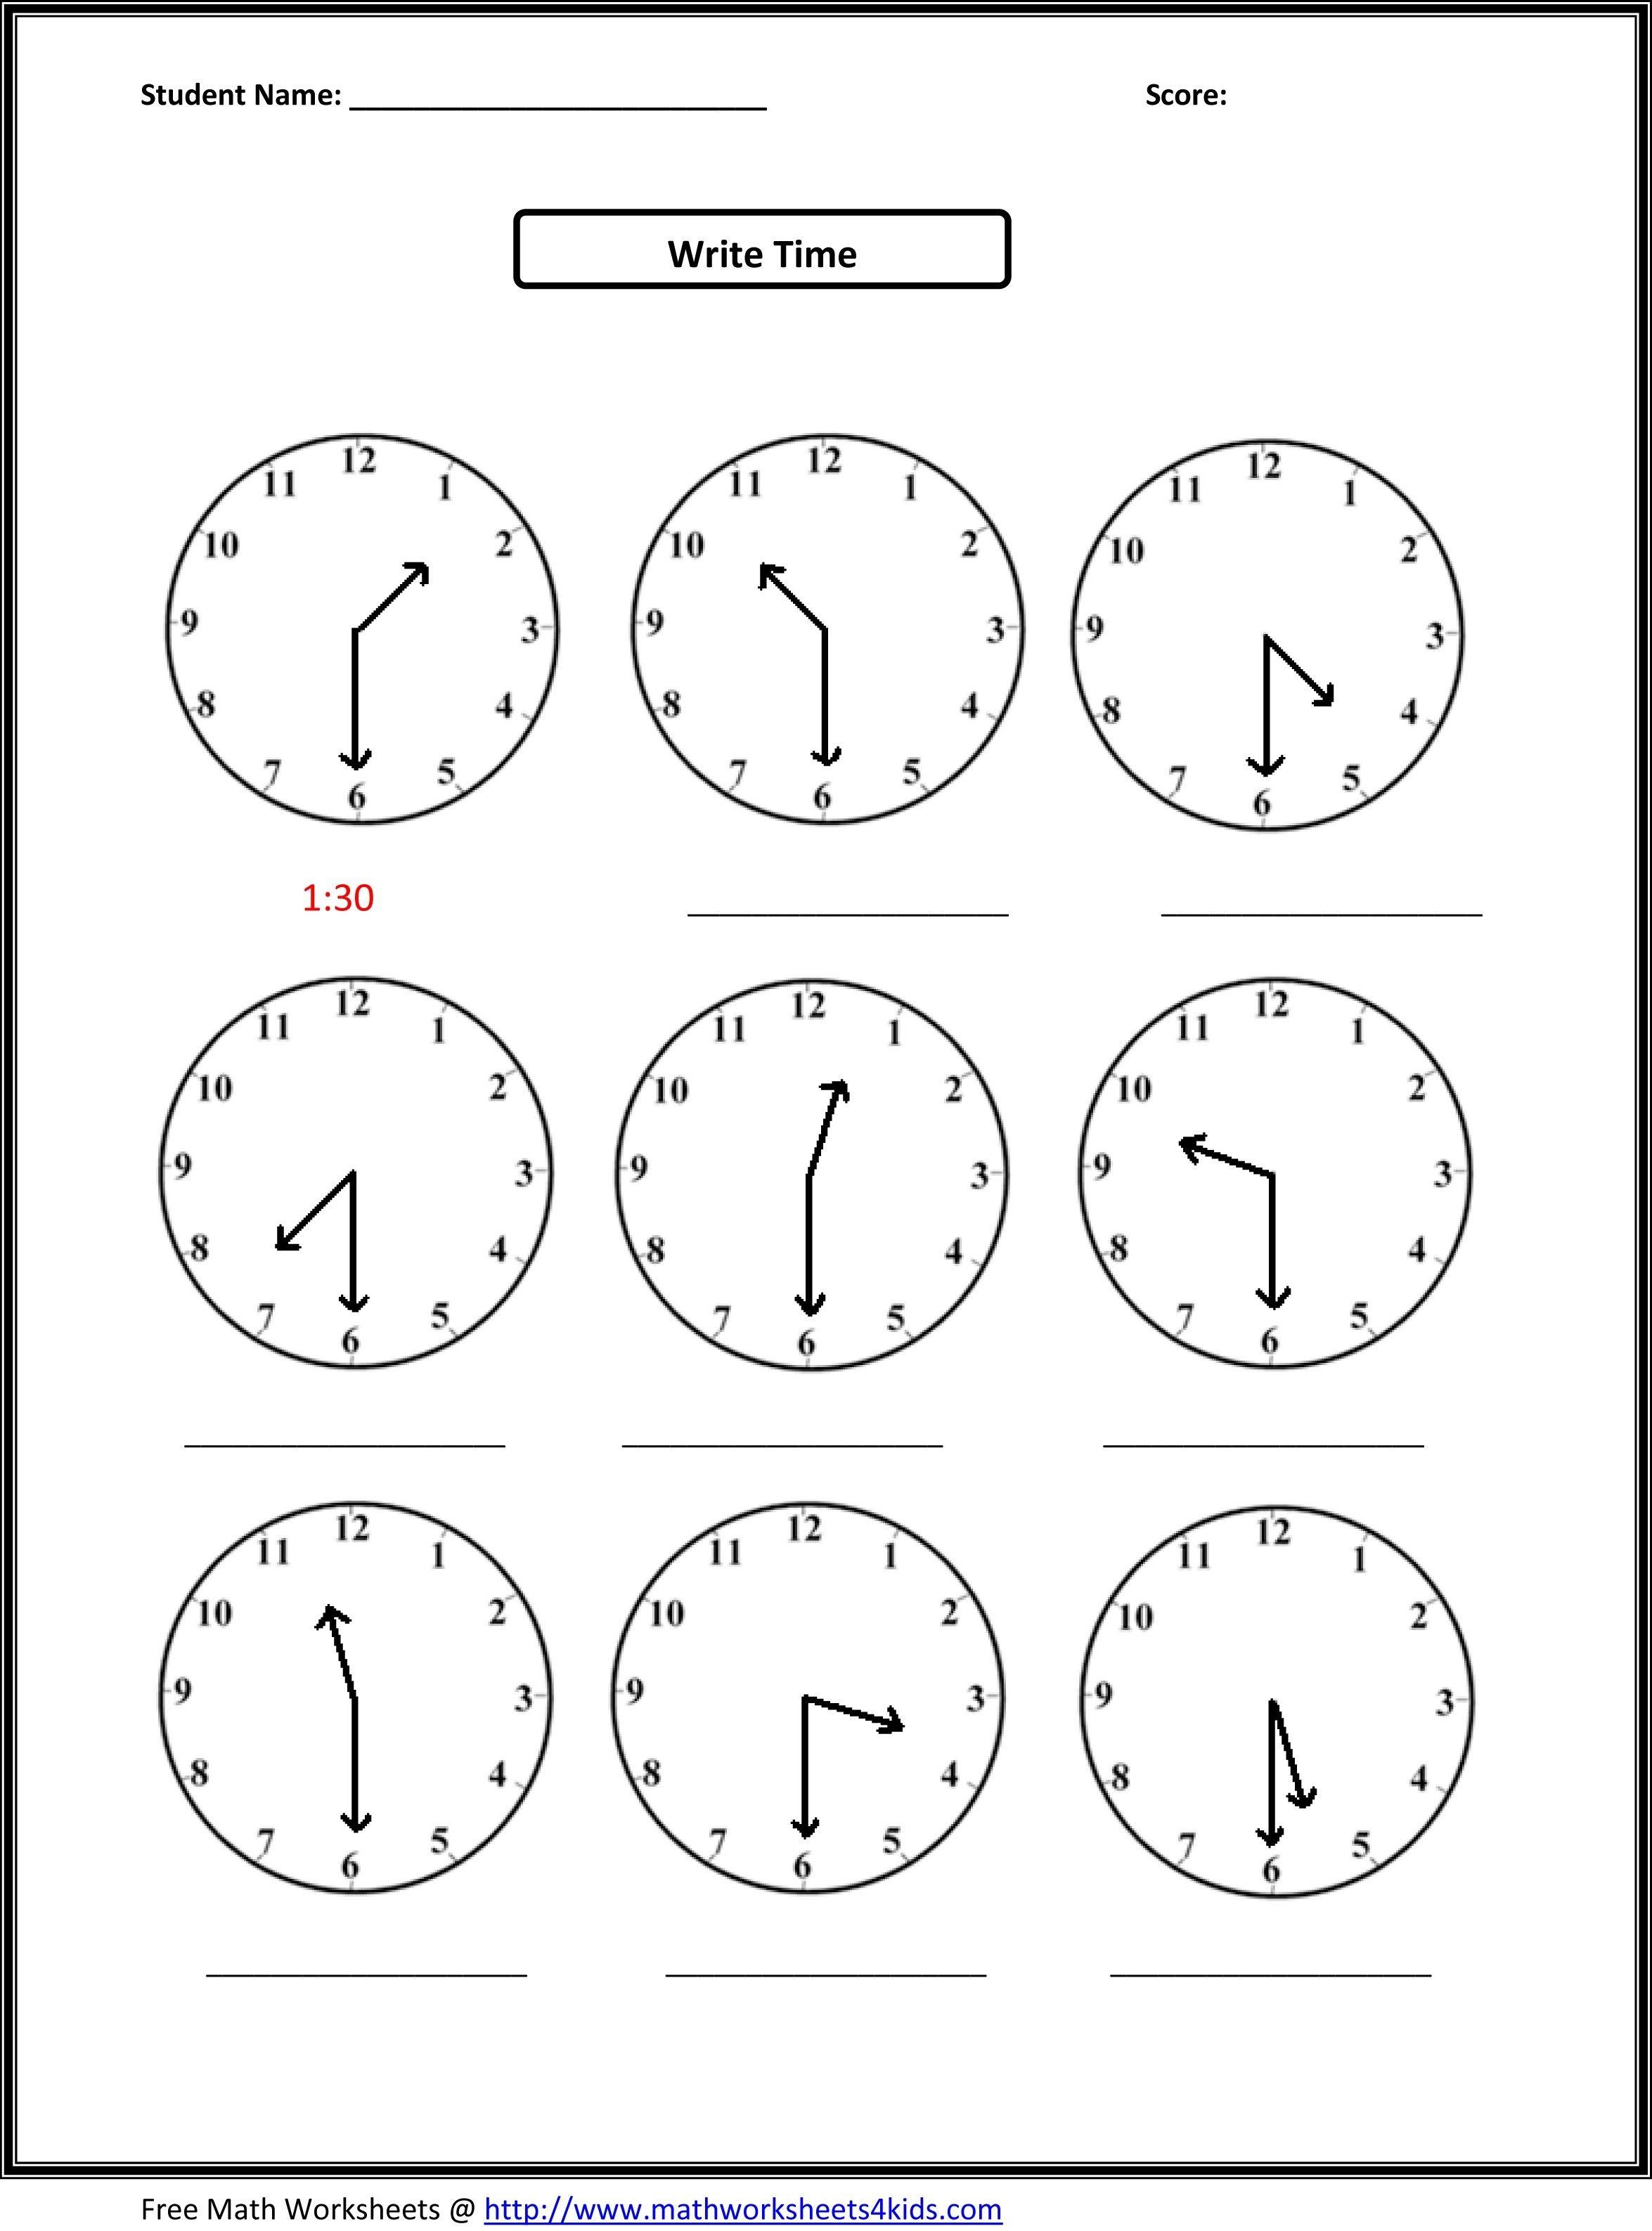 2Nd Grade Free Worksheets Math | Math: Time/measurement | 2Nd Grade - Free Printable First Grade Math Worksheets